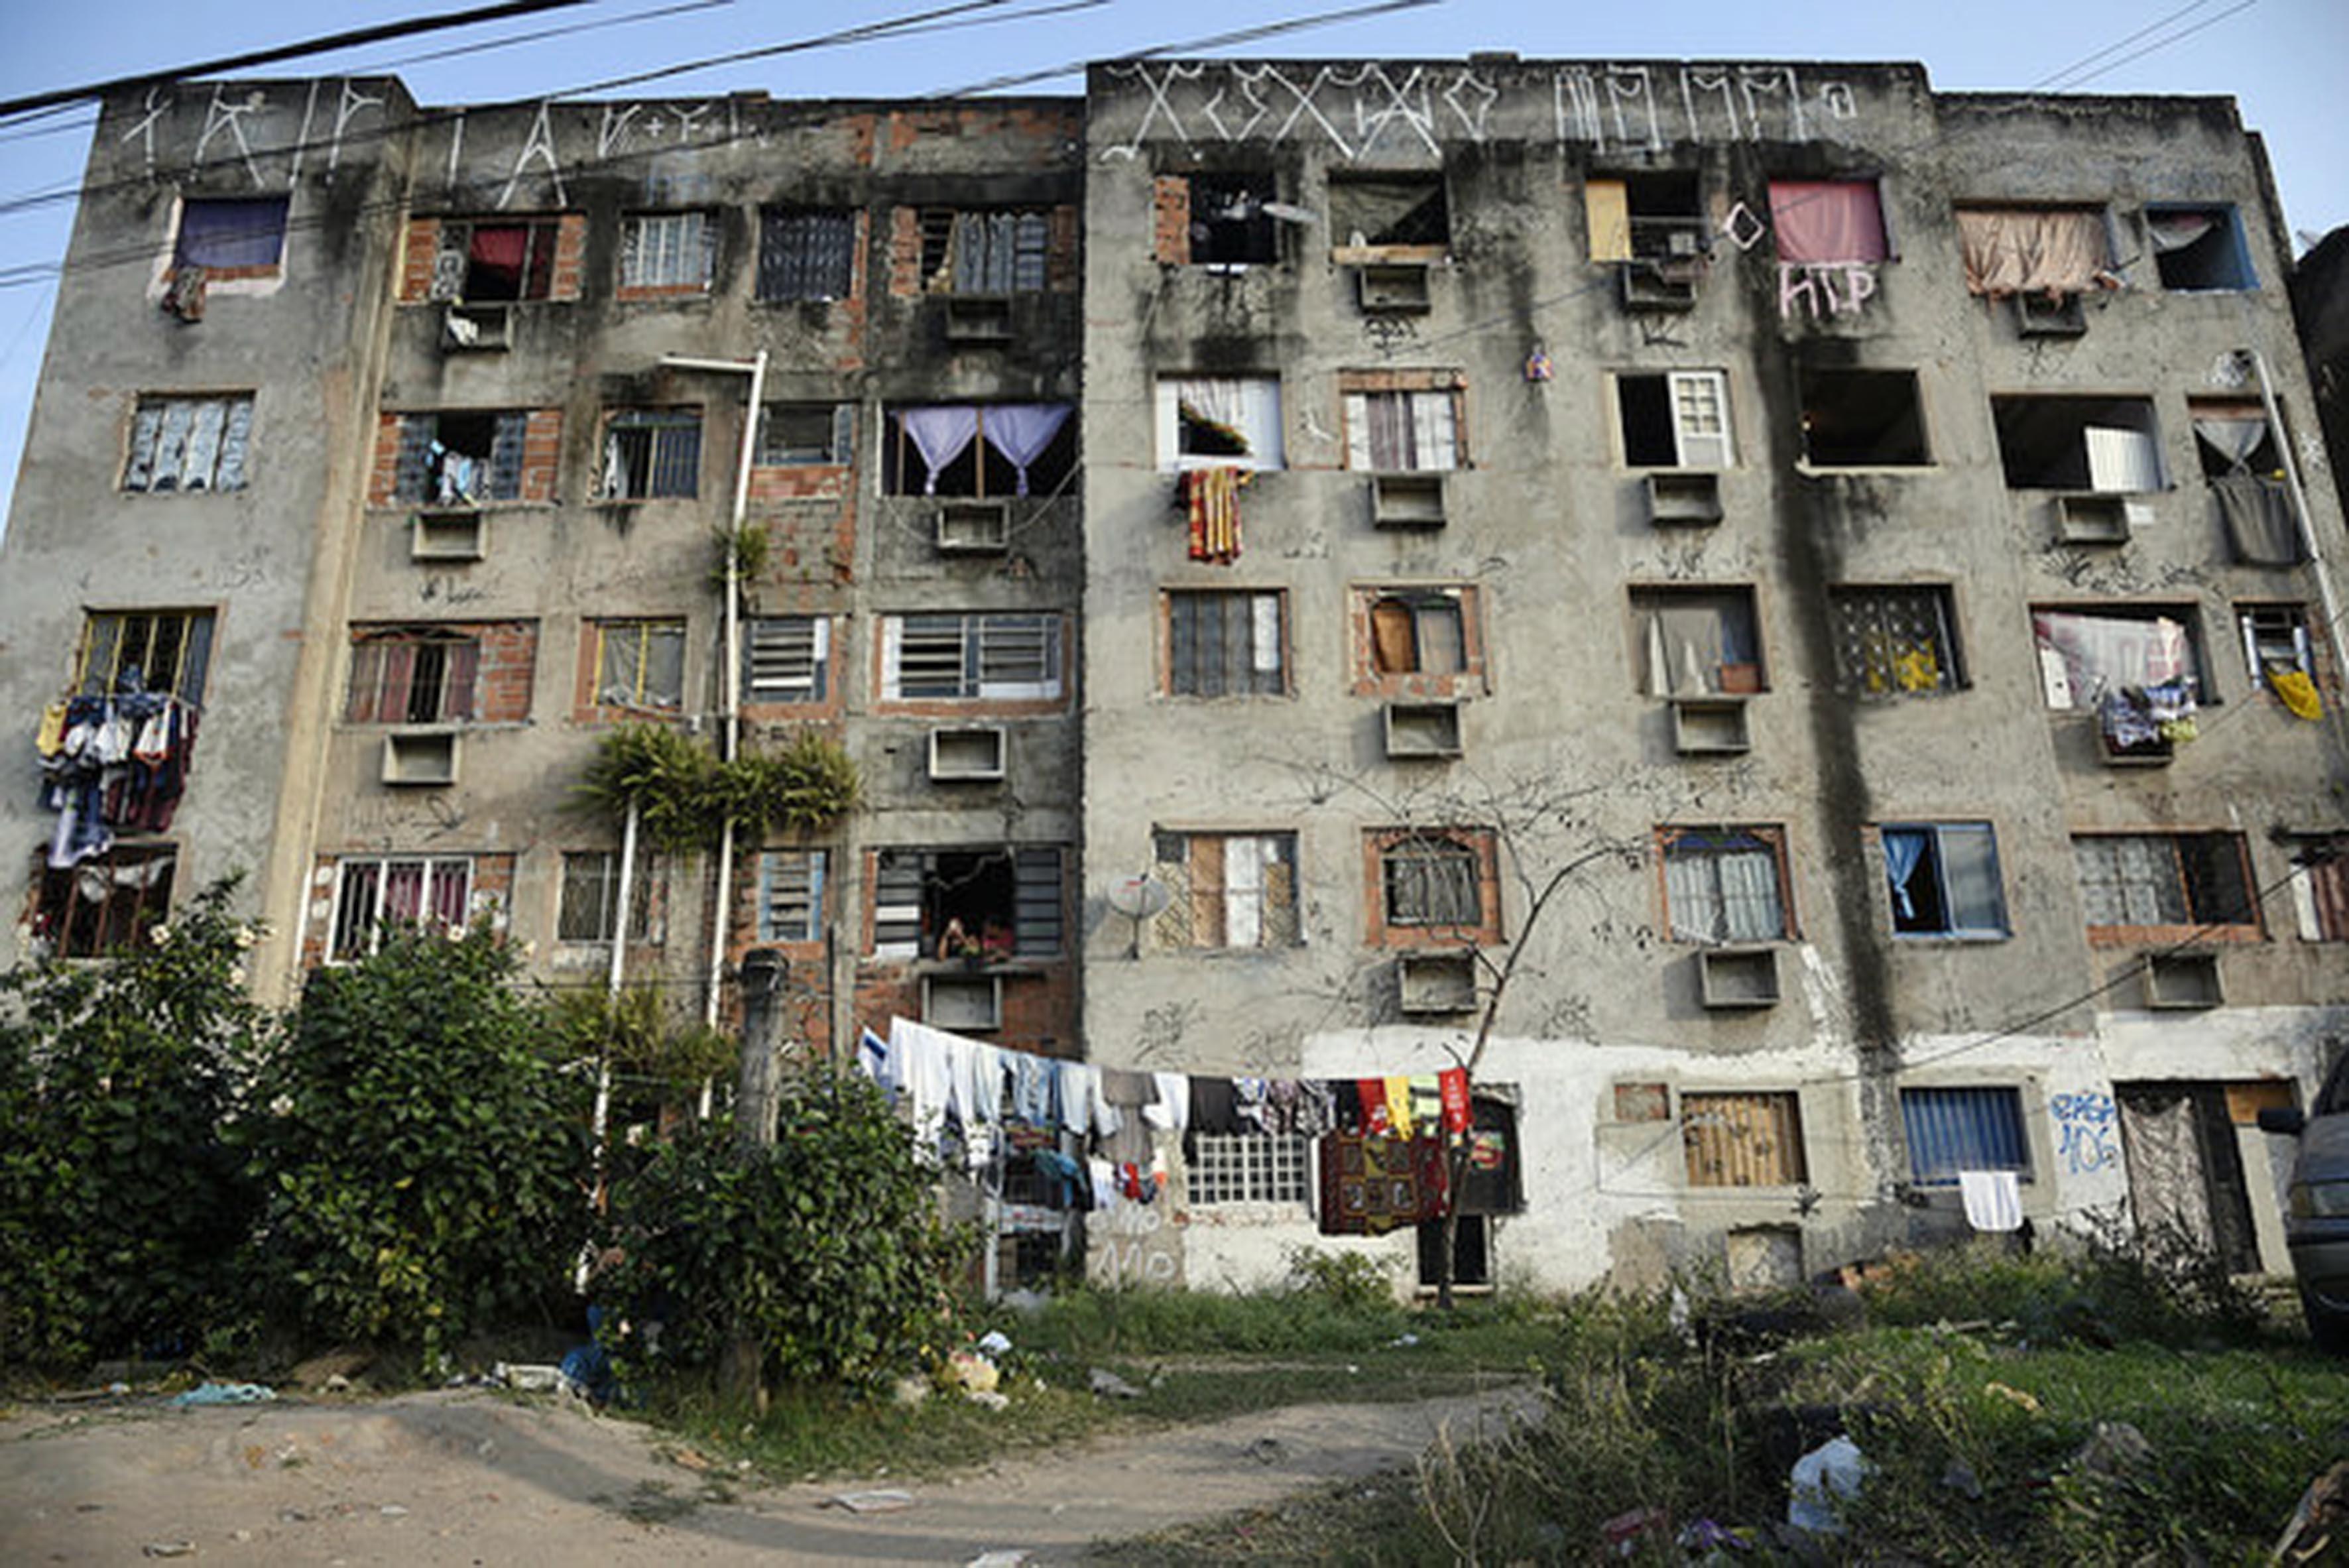 Moradores denunciam que milícia está loteando terreno de condomínio demolido em Campo Grande, na Zona Oeste do Rio